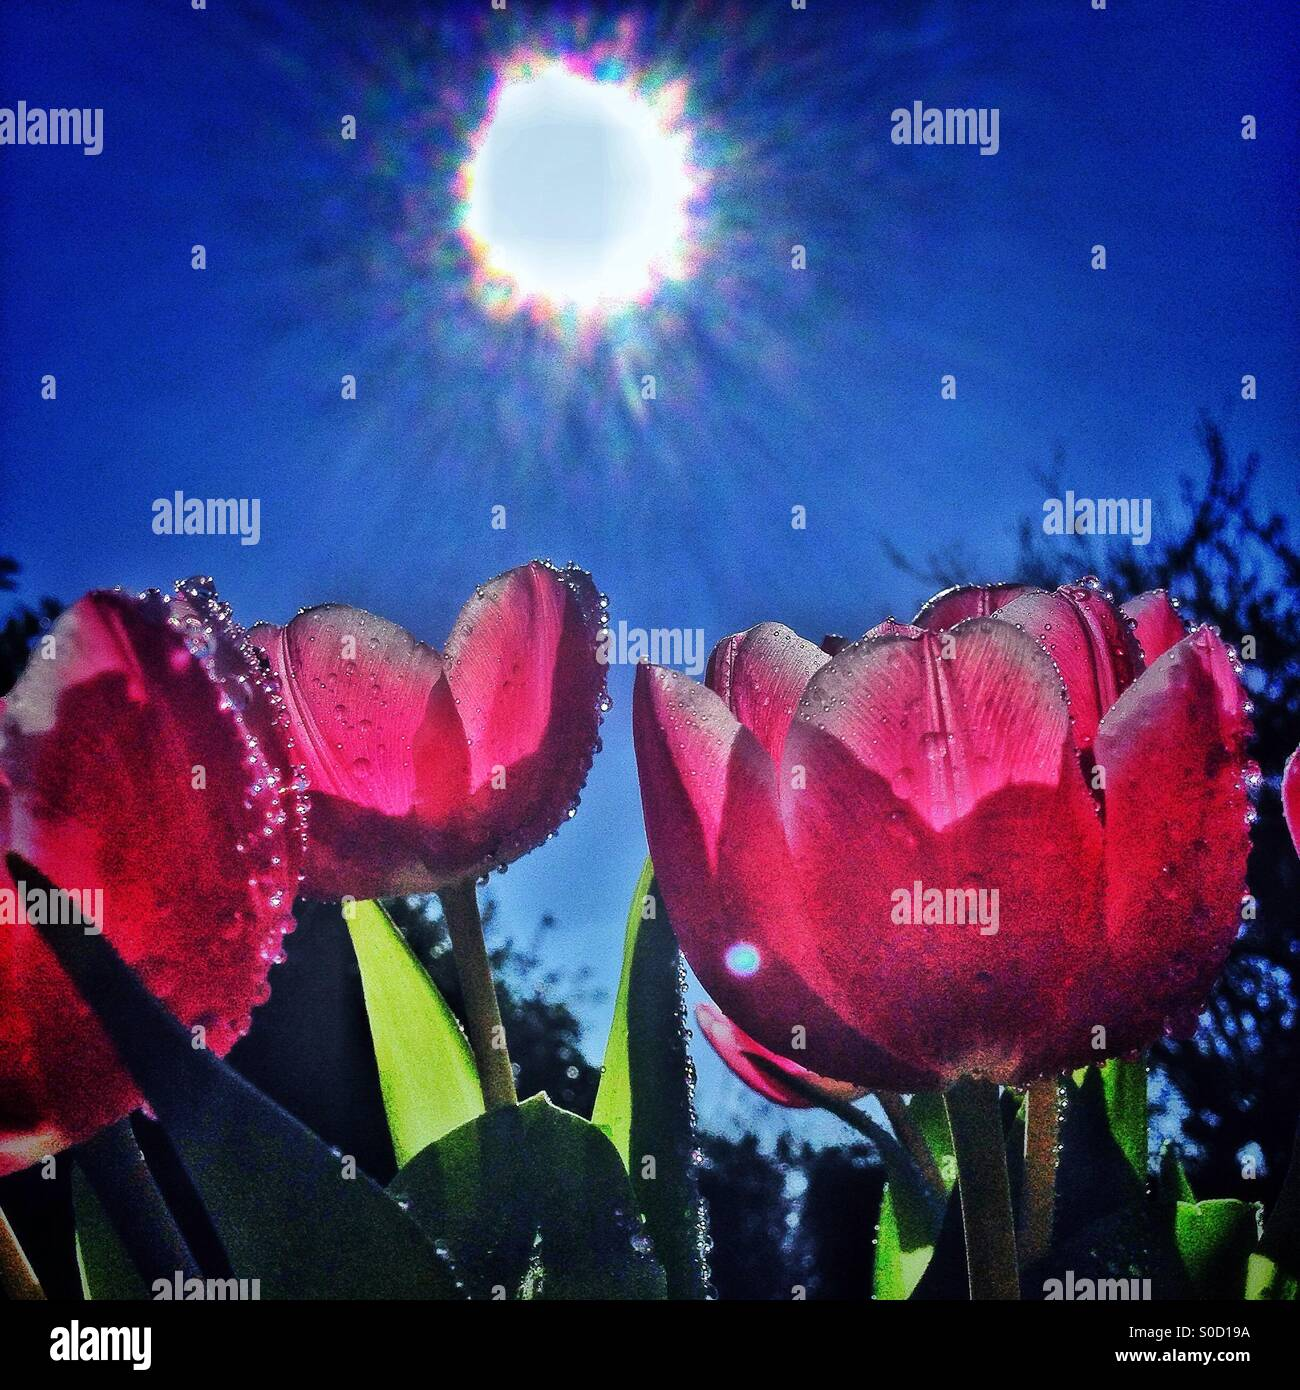 Sunshine and tulips - Stock Image